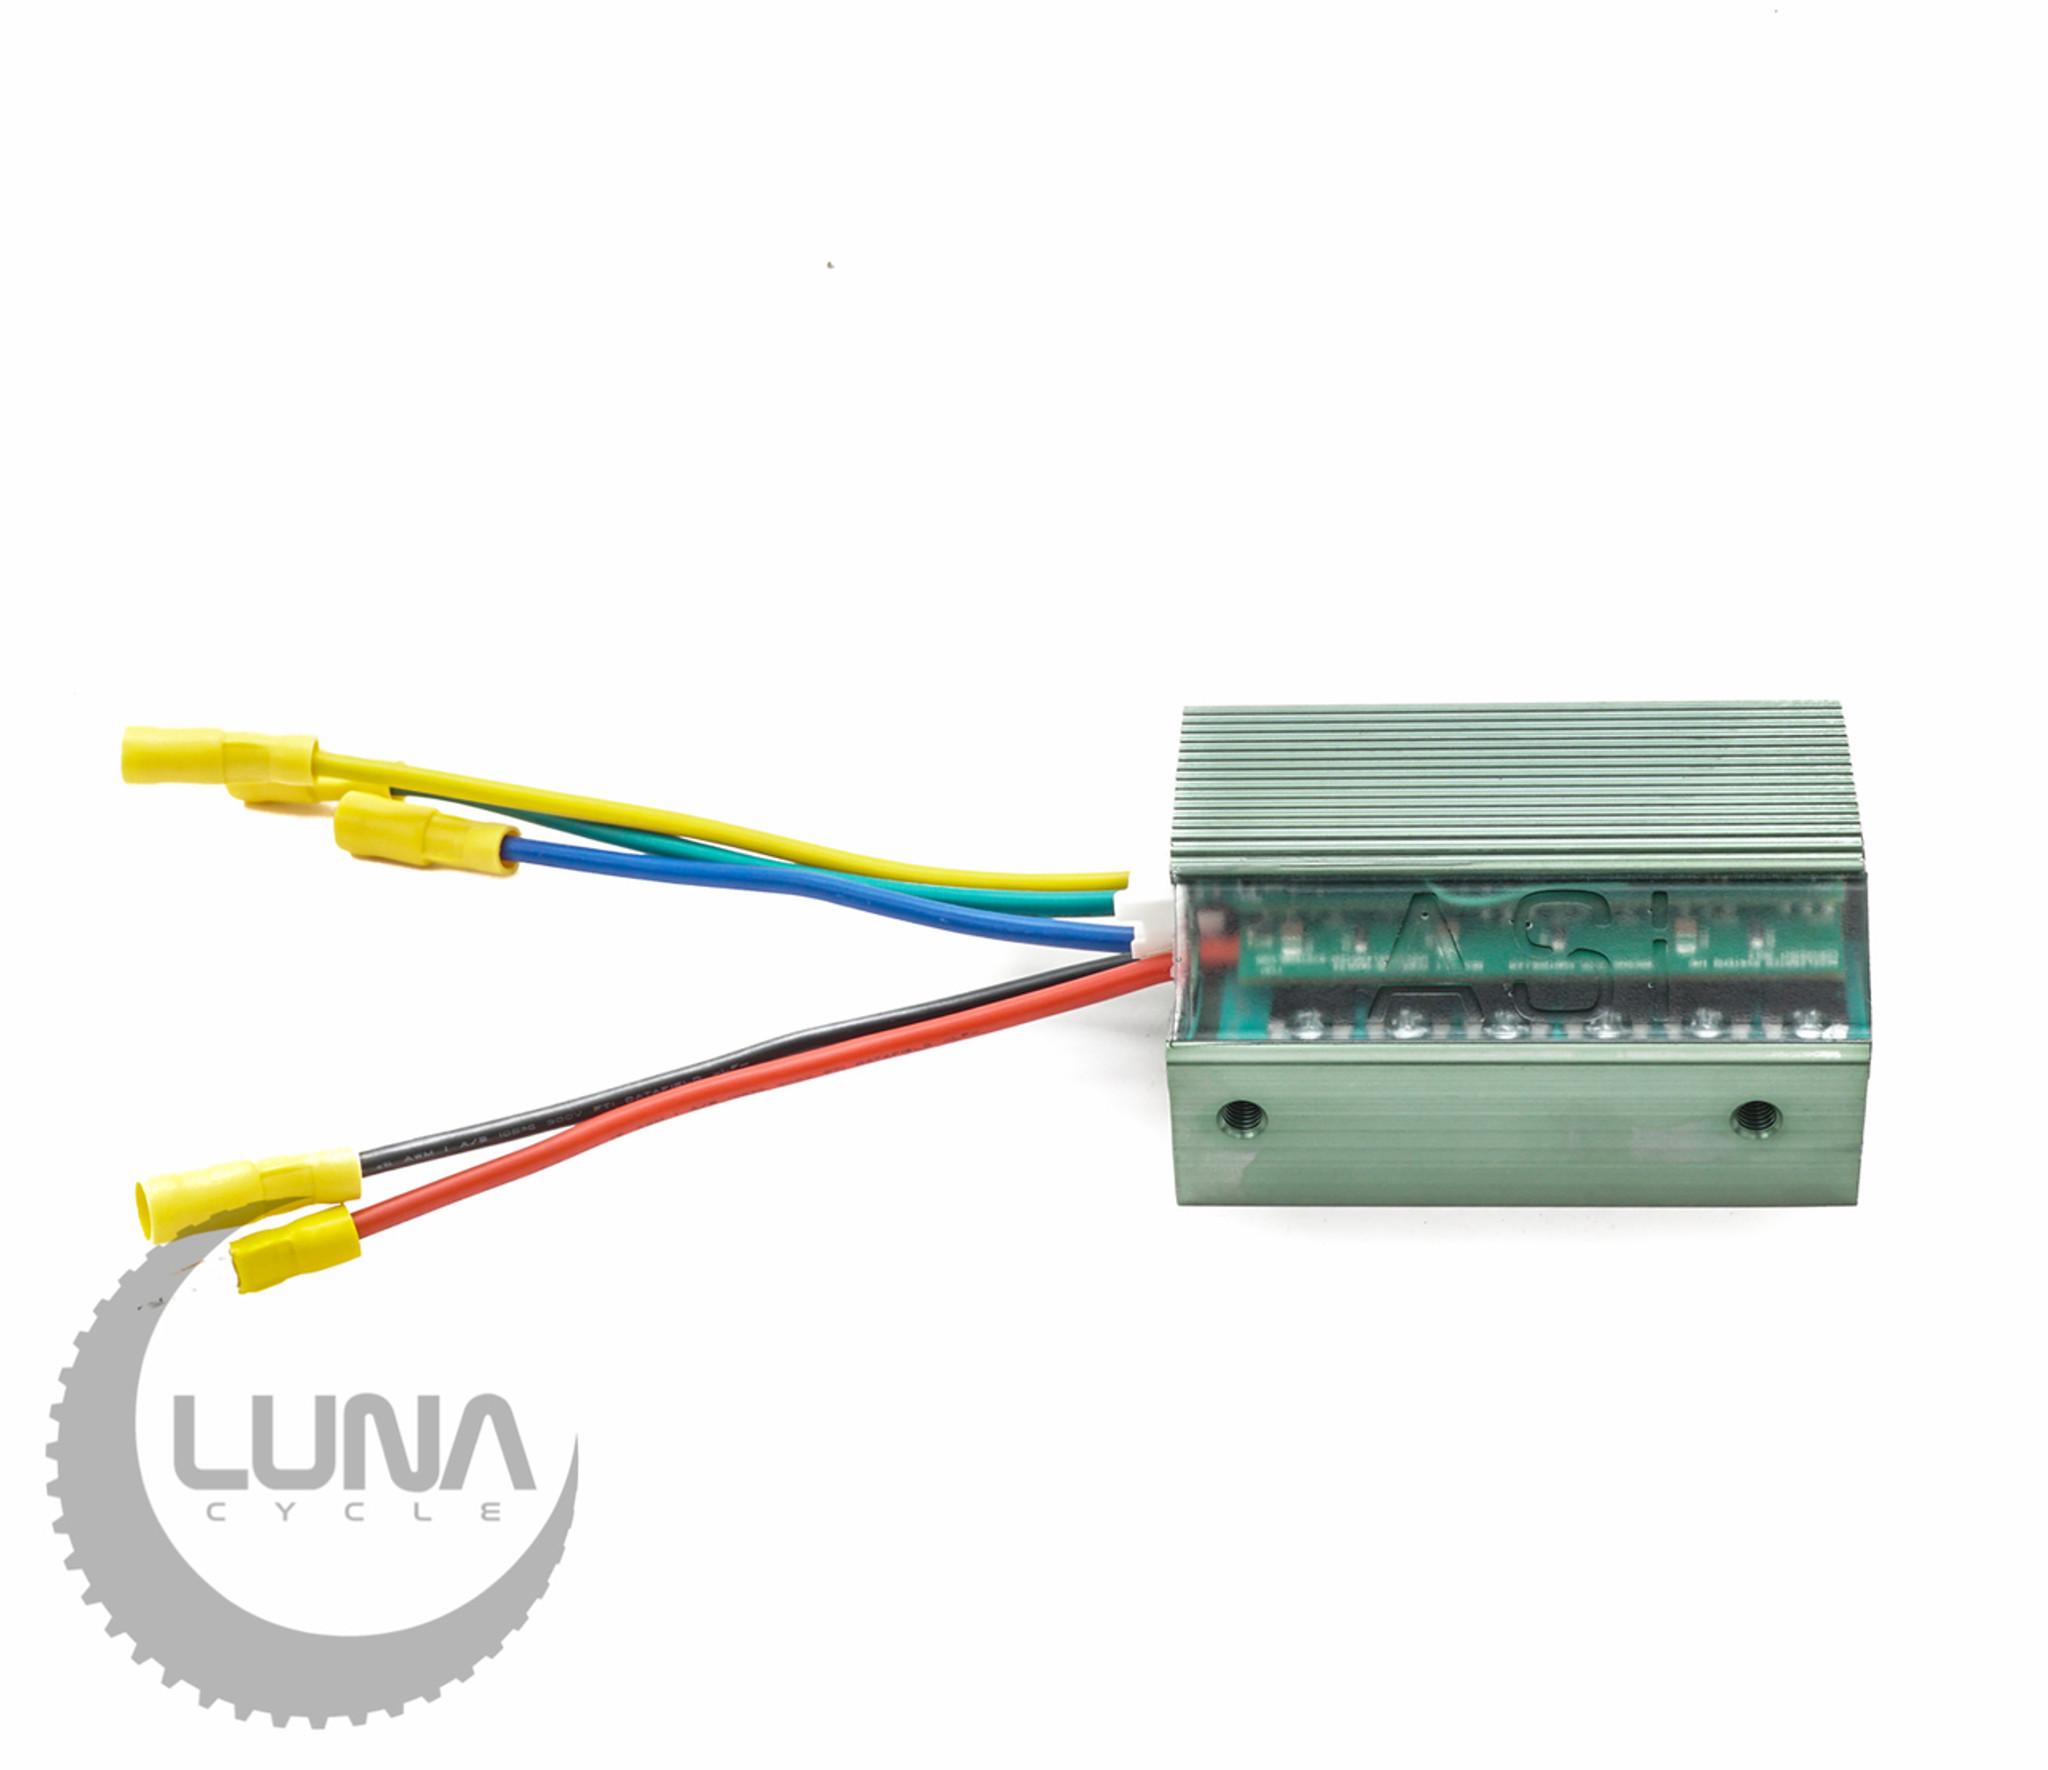 medium resolution of wiring diagram for bac wiring library rh 50 skriptoase de wiring diagram for bachmann controller wiring diagram for bachmann diesel horn